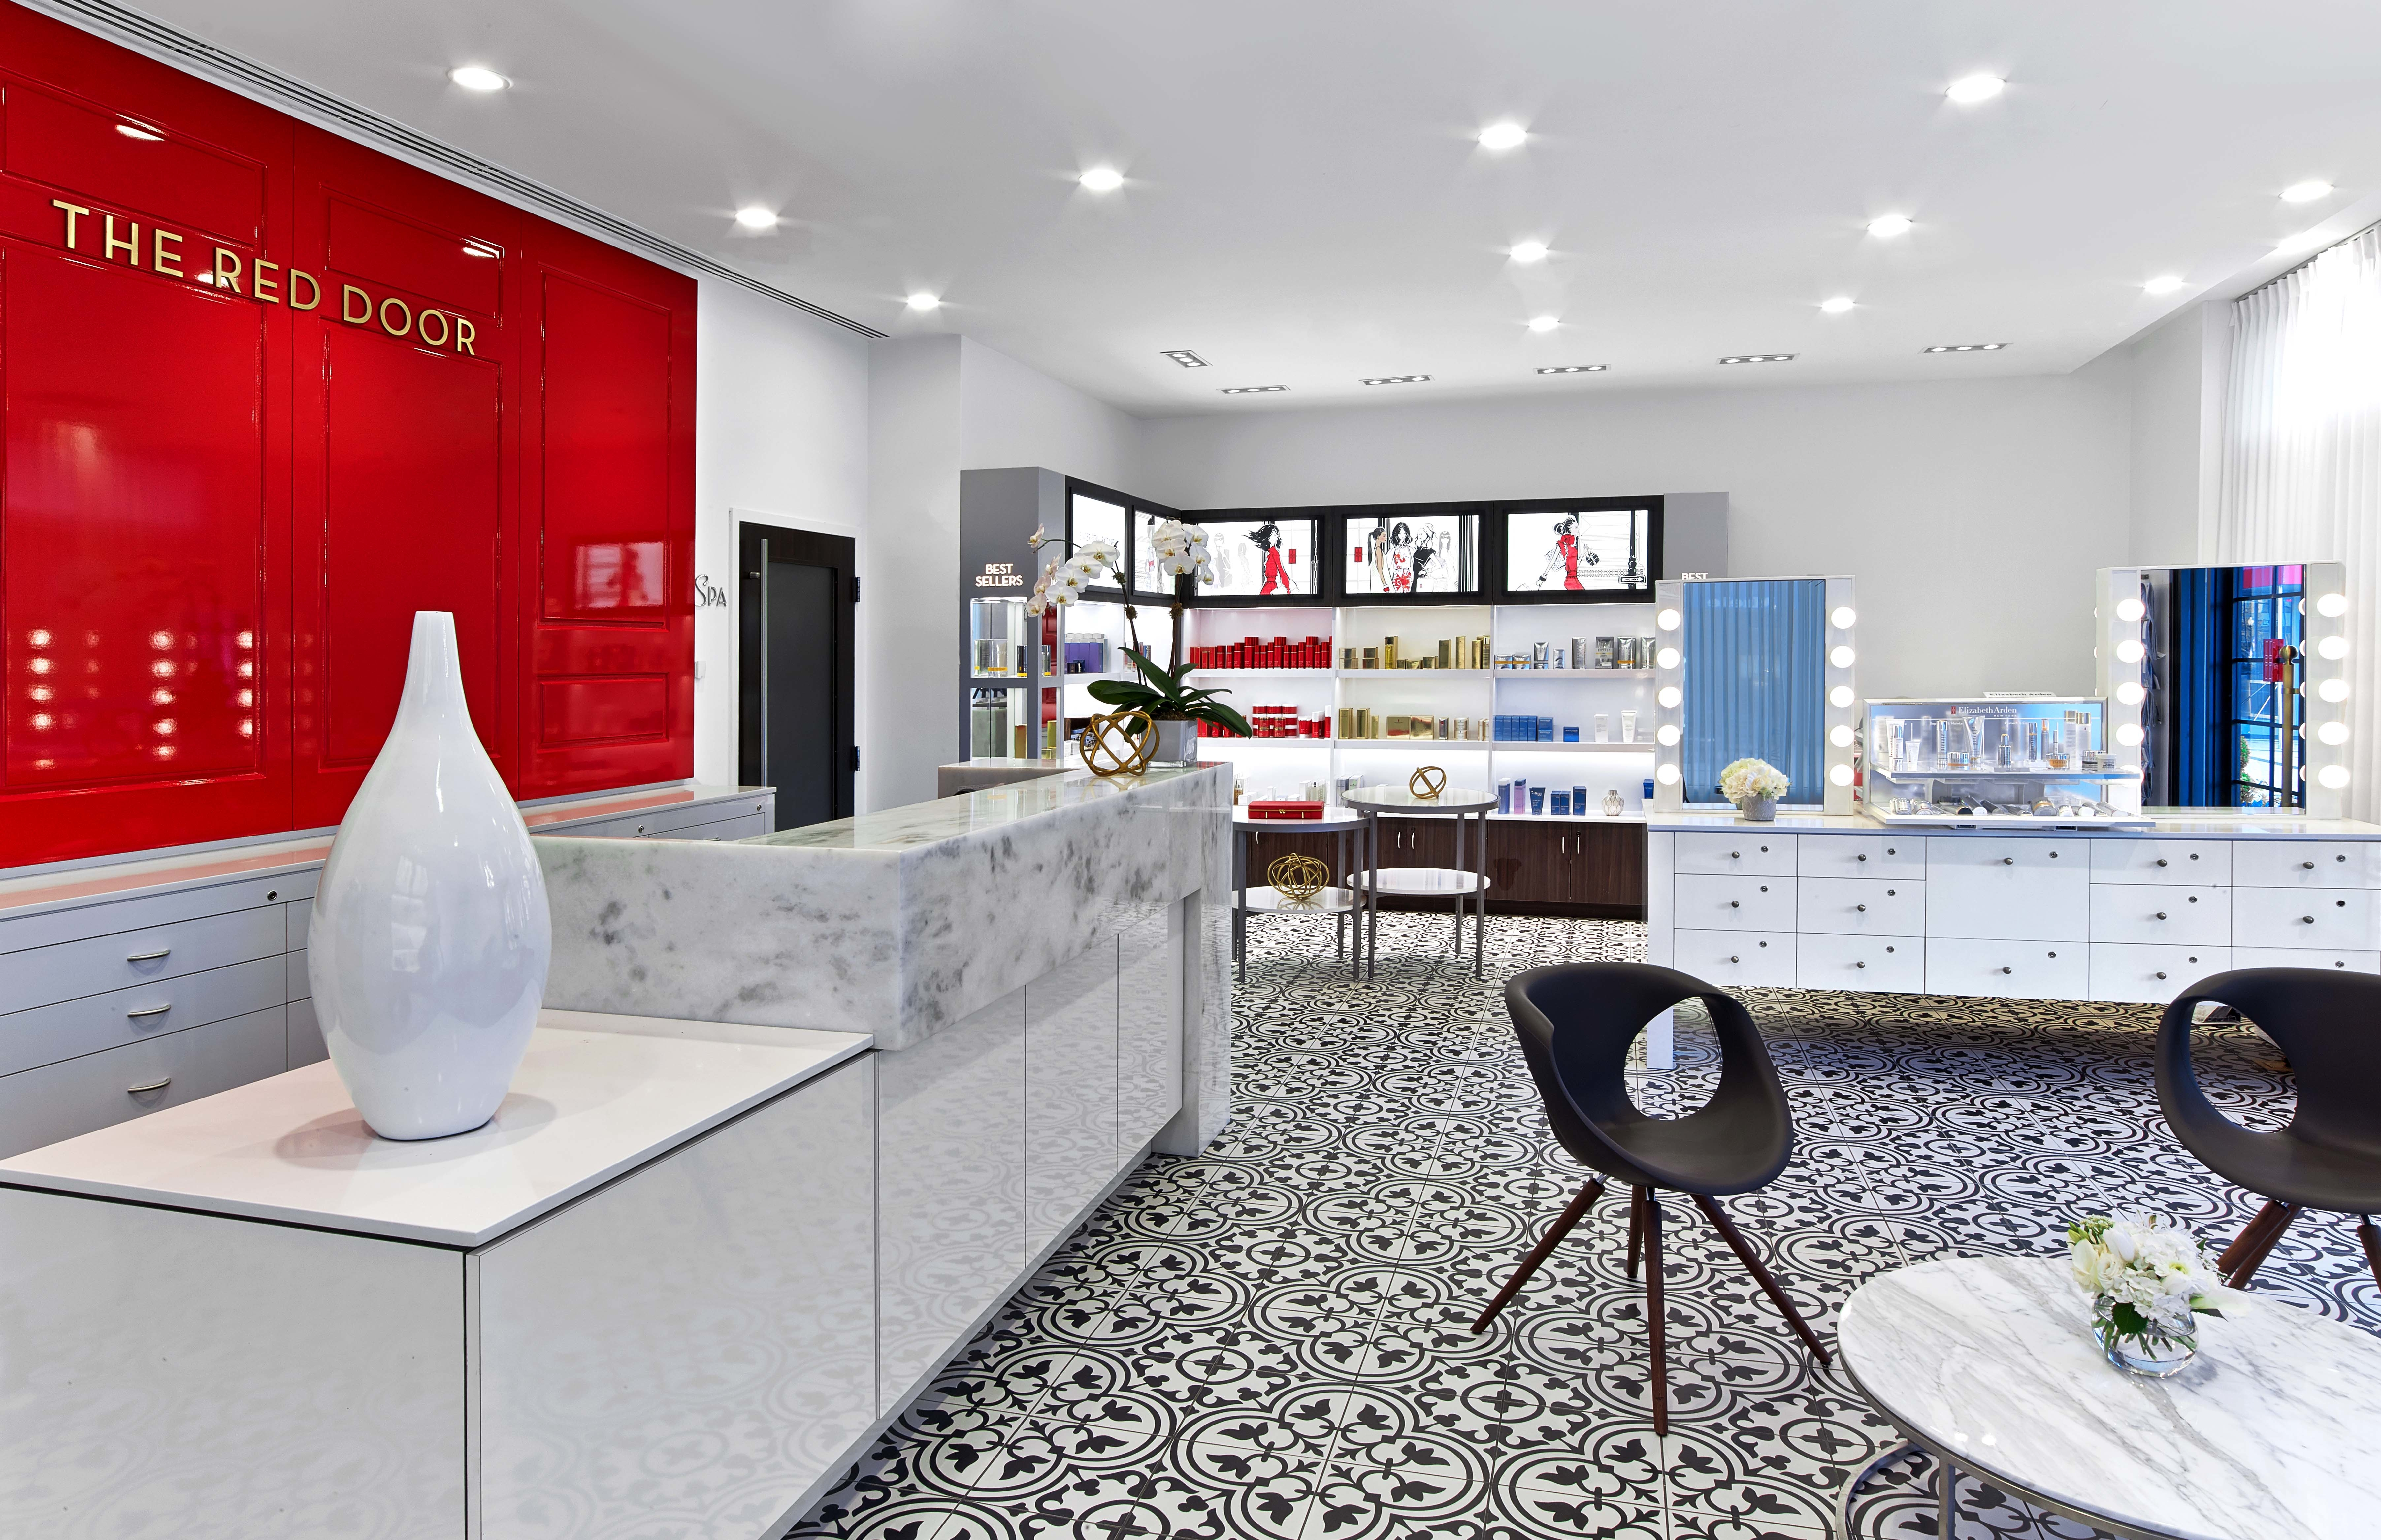 The Red Door Salon Amp Spa In Vienna Va 22182